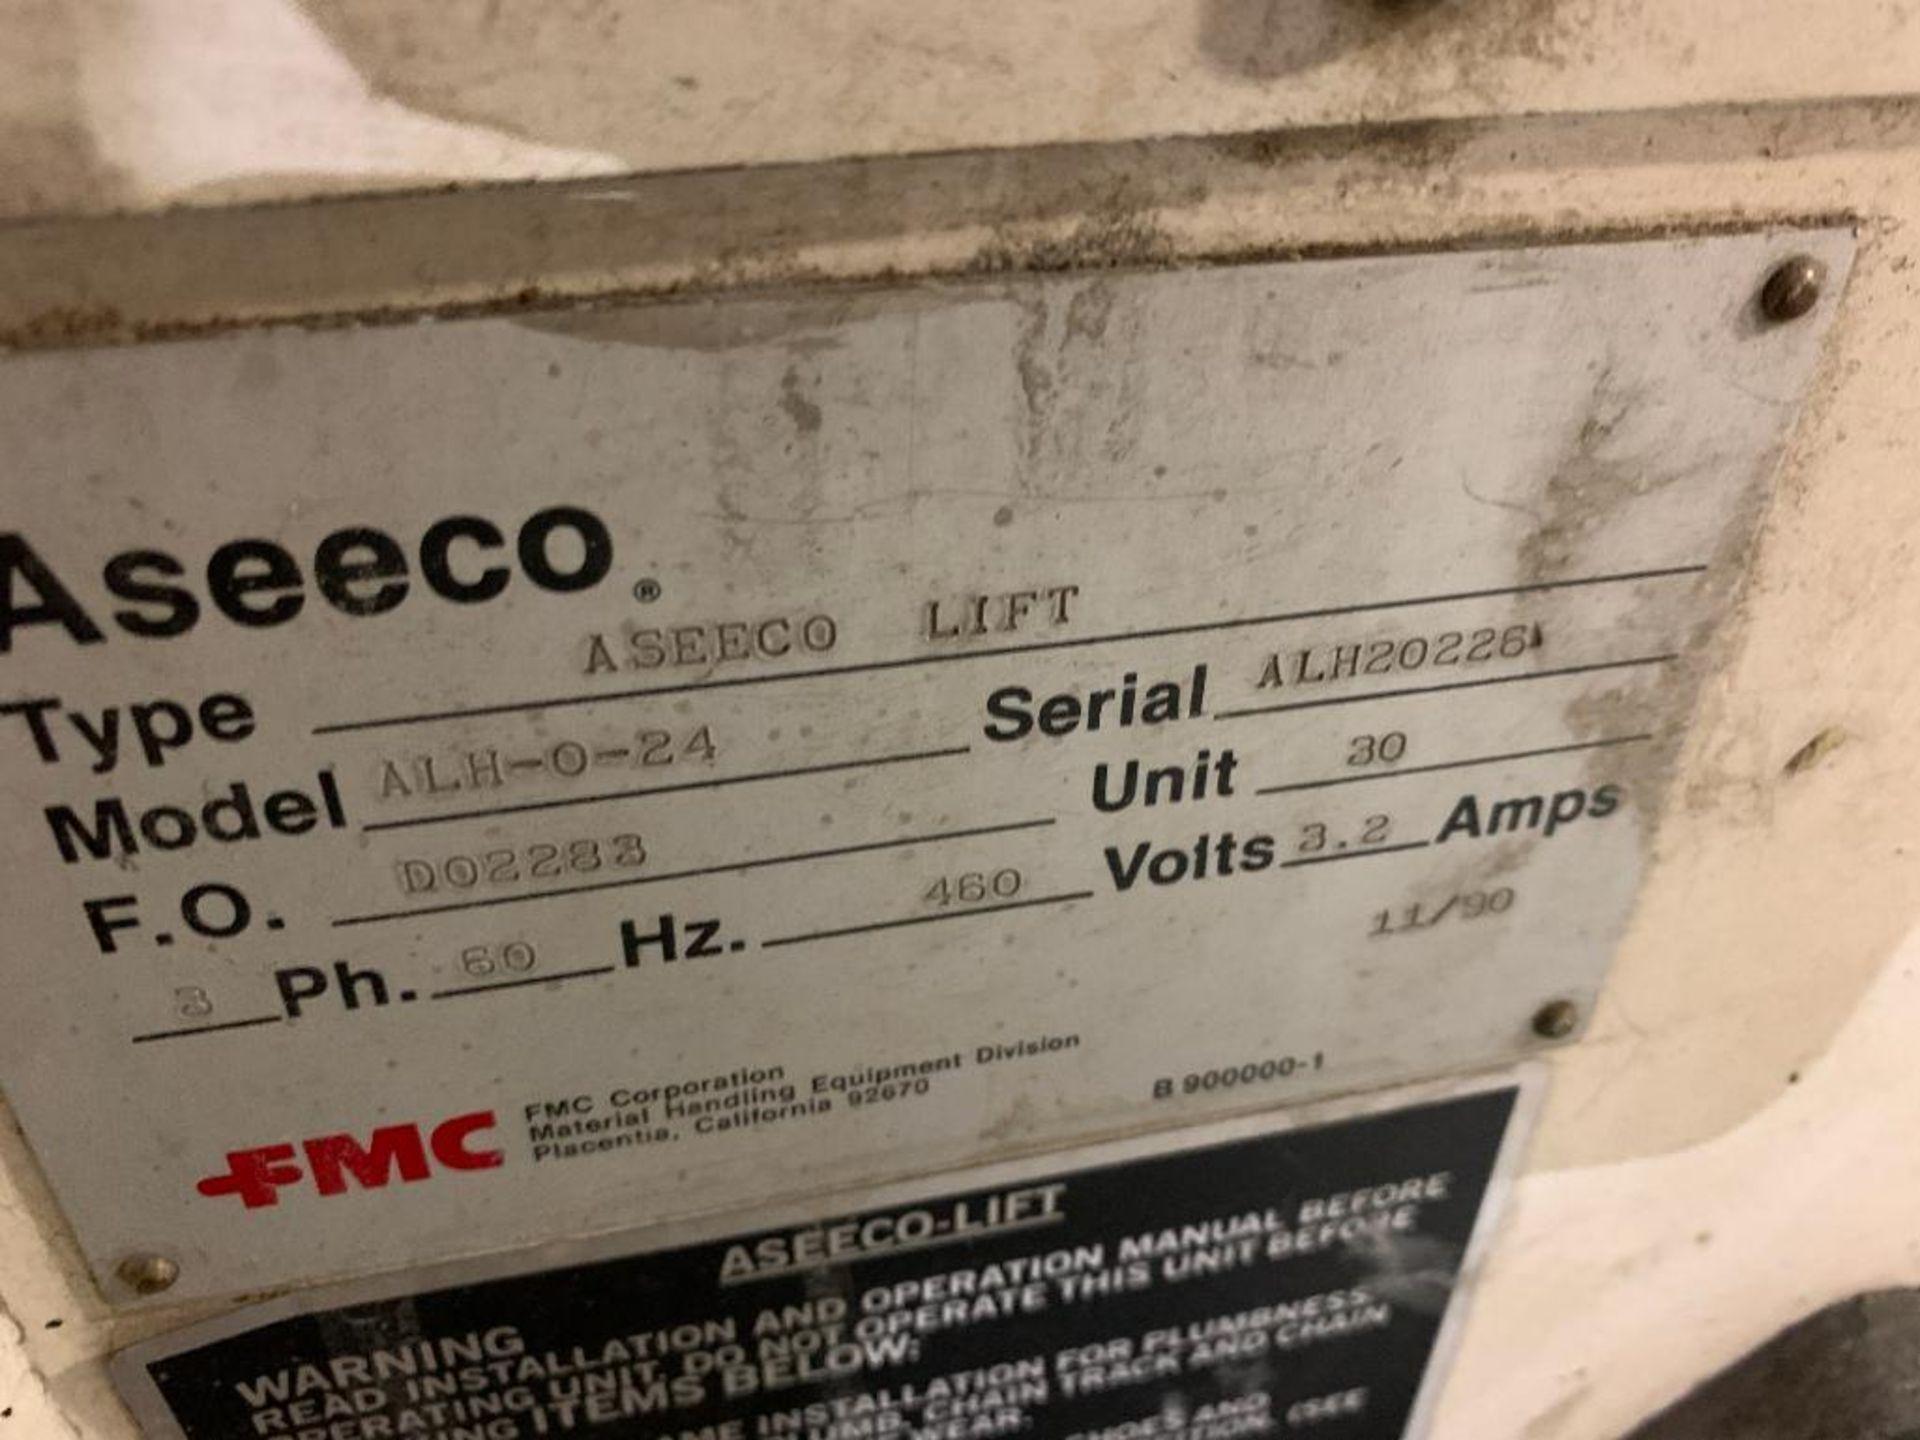 1992 Aseeco horizontal bucket elevator, model ALH-0-24-CP - Image 3 of 18